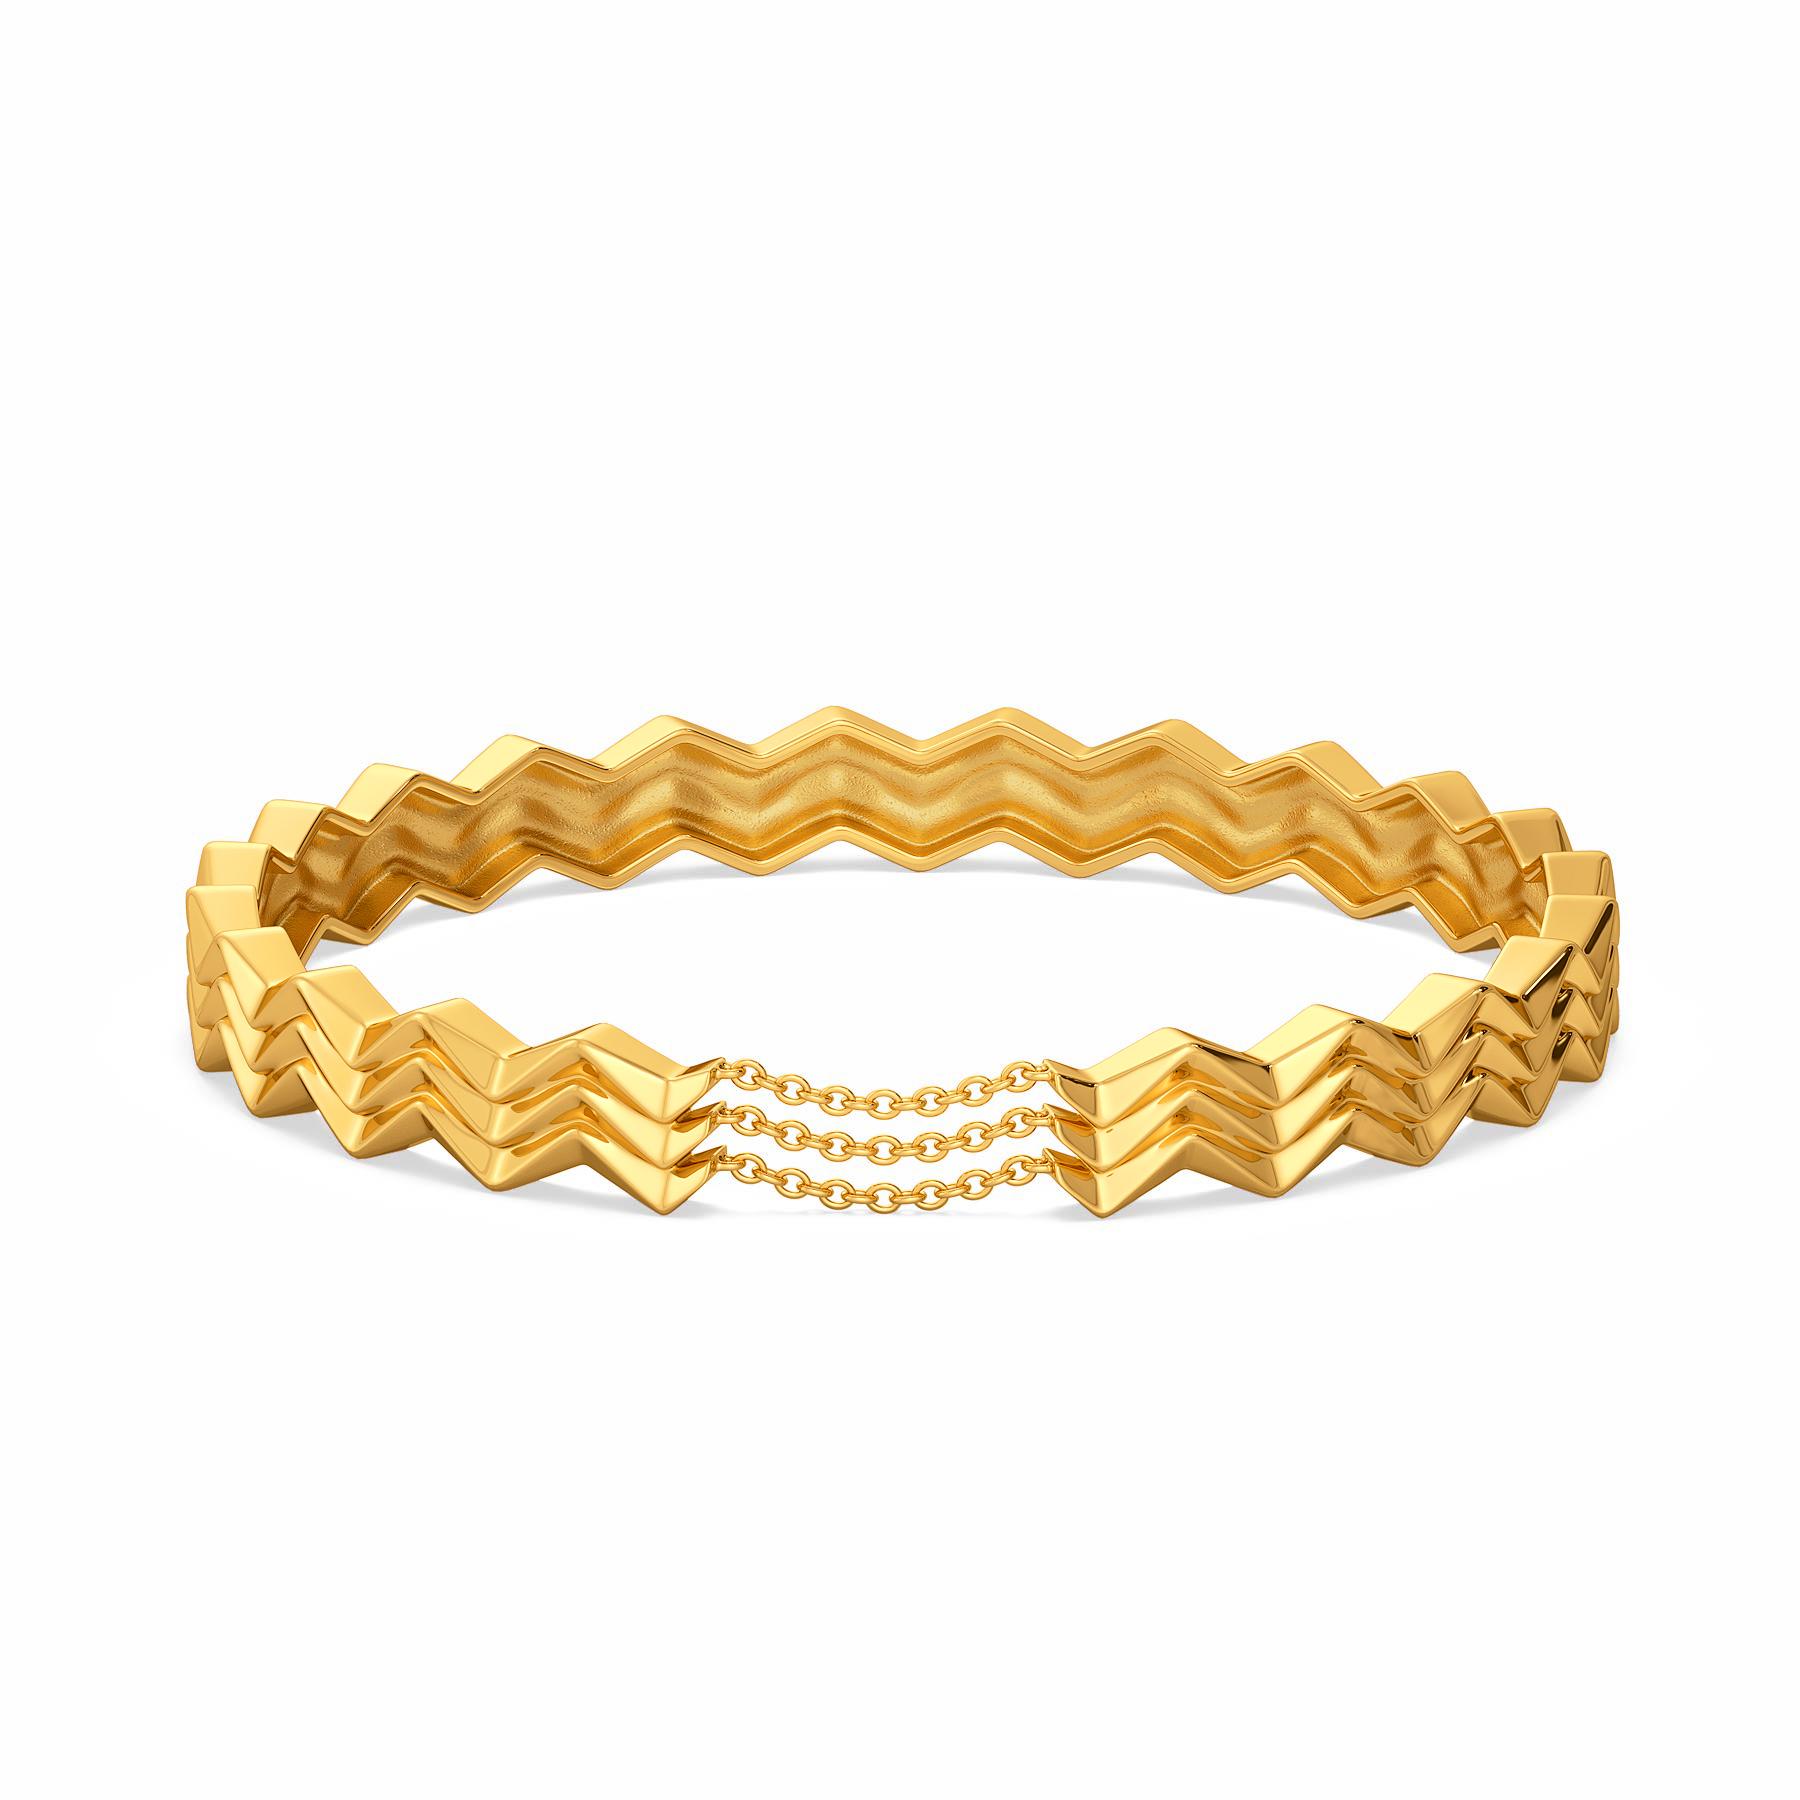 Chain Rebel Gold Bangles